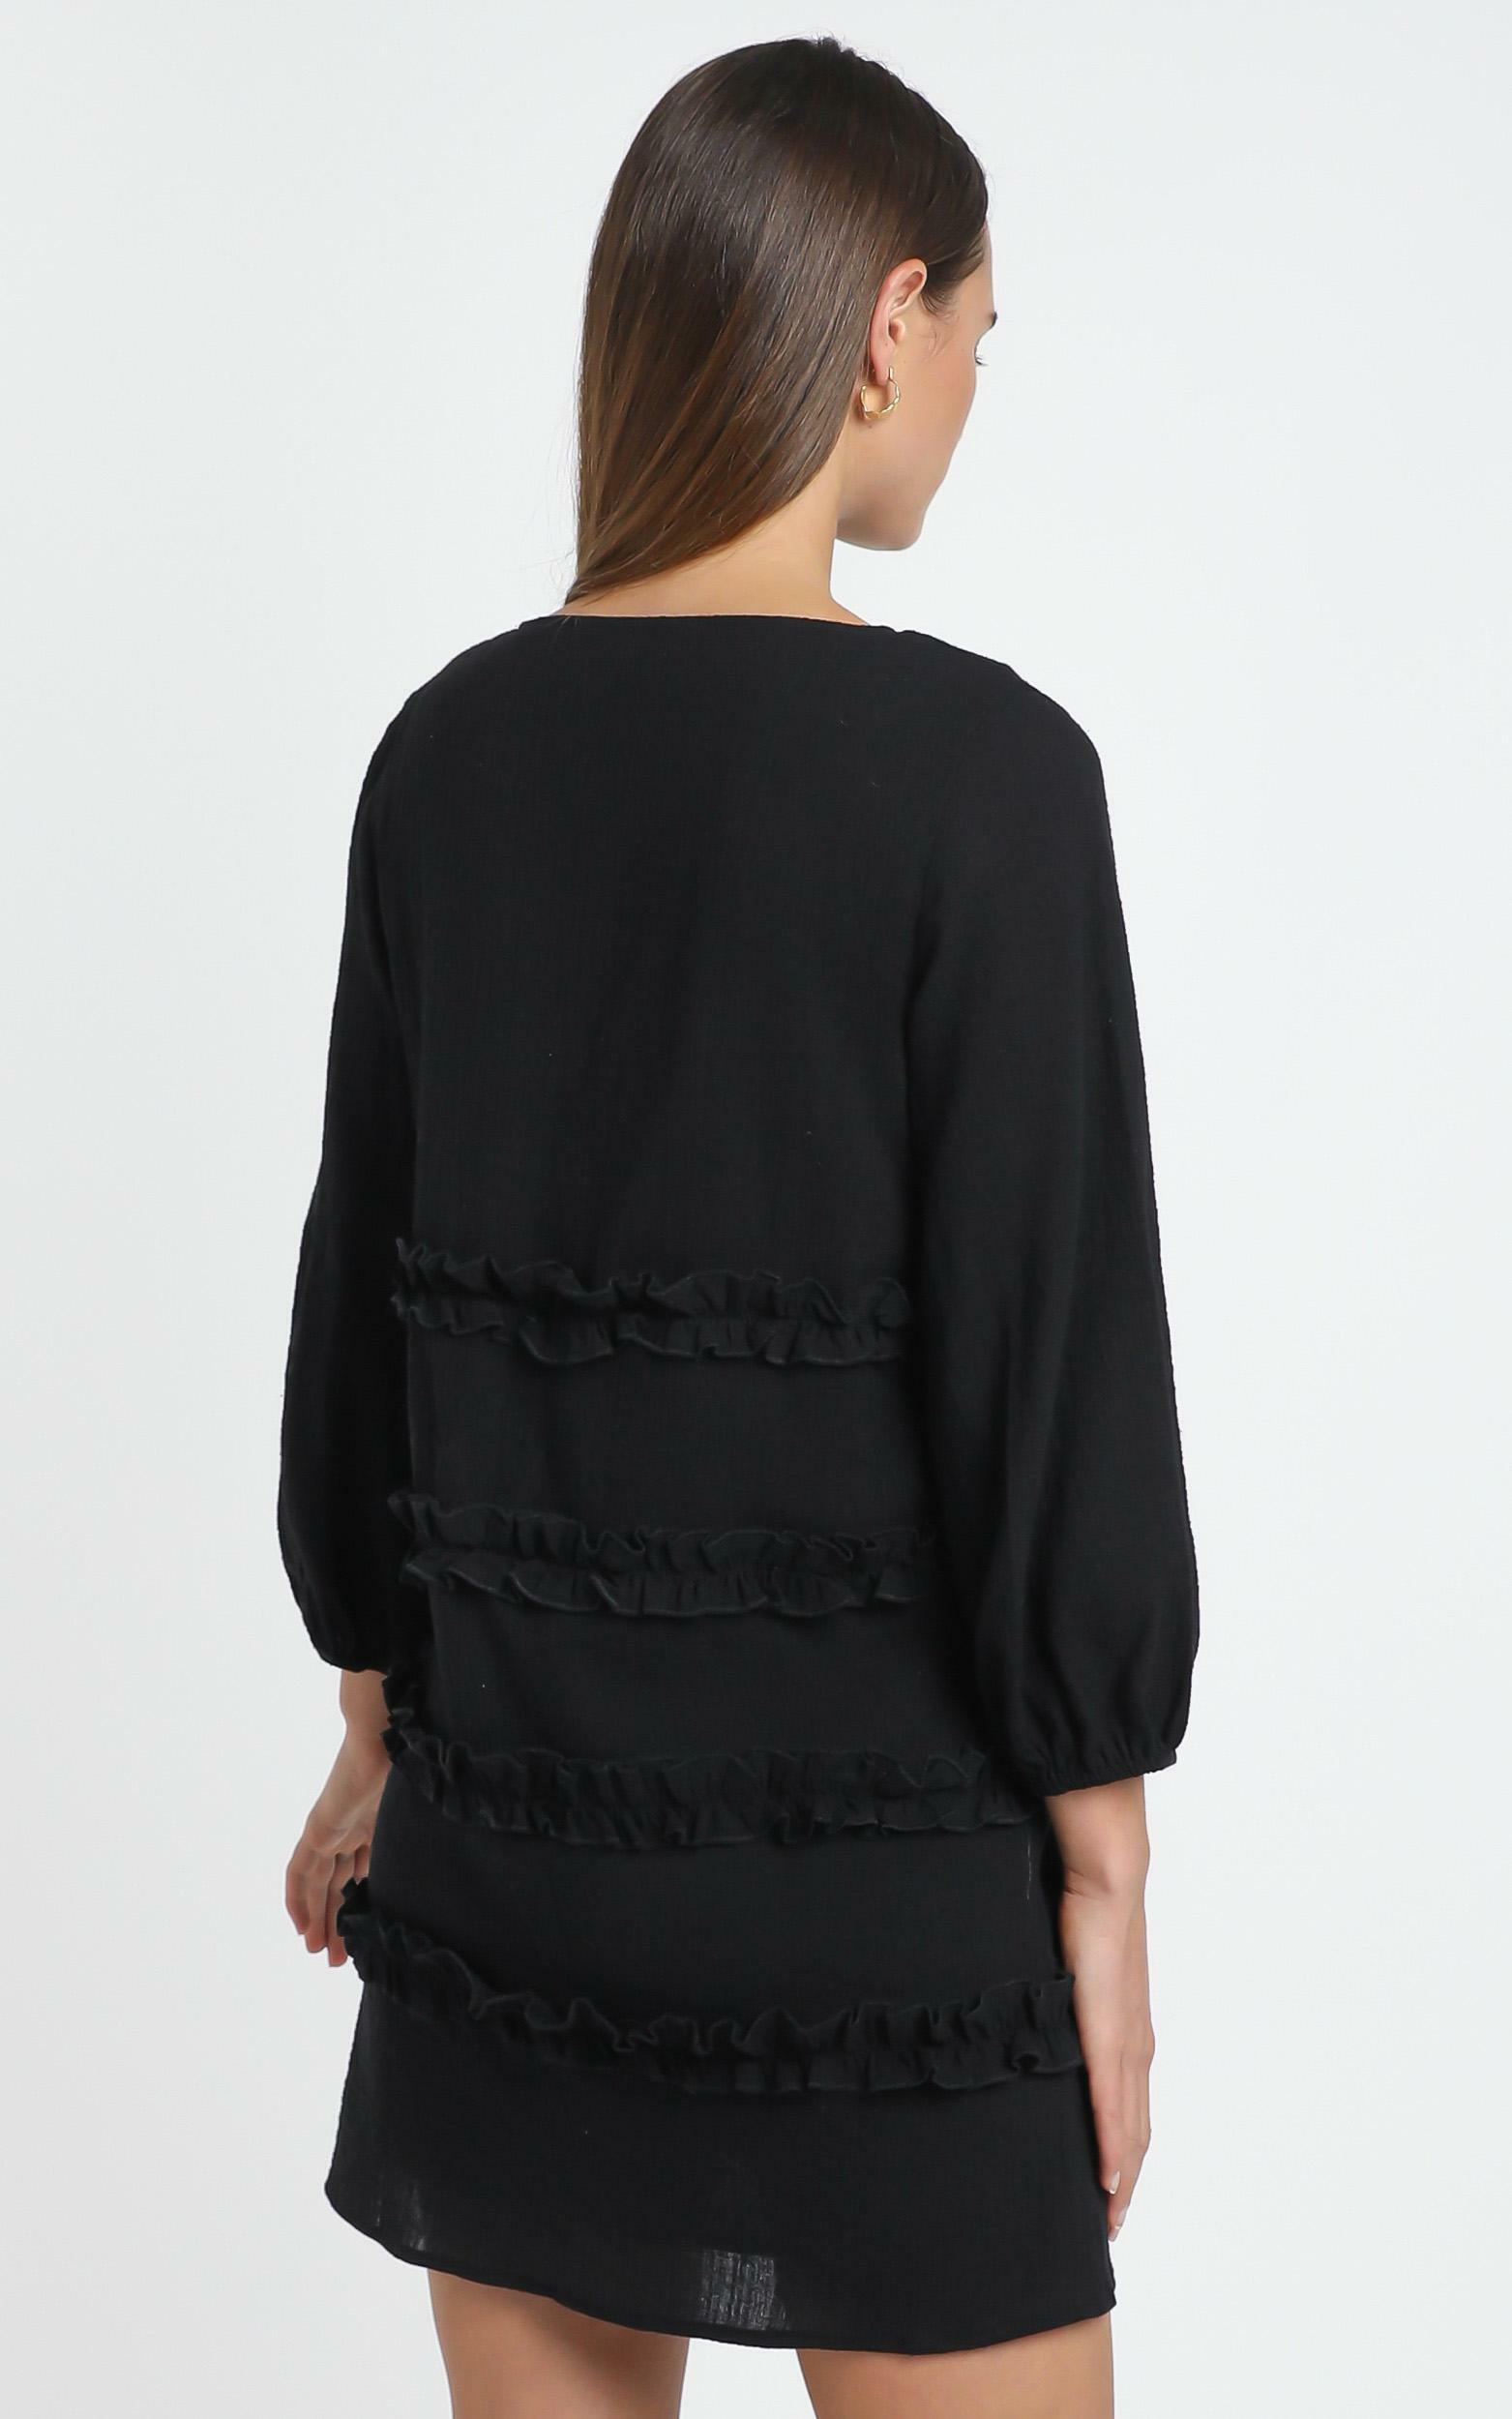 Sweetest Cheer Dress in black - 18 (XXXL), Black, hi-res image number null